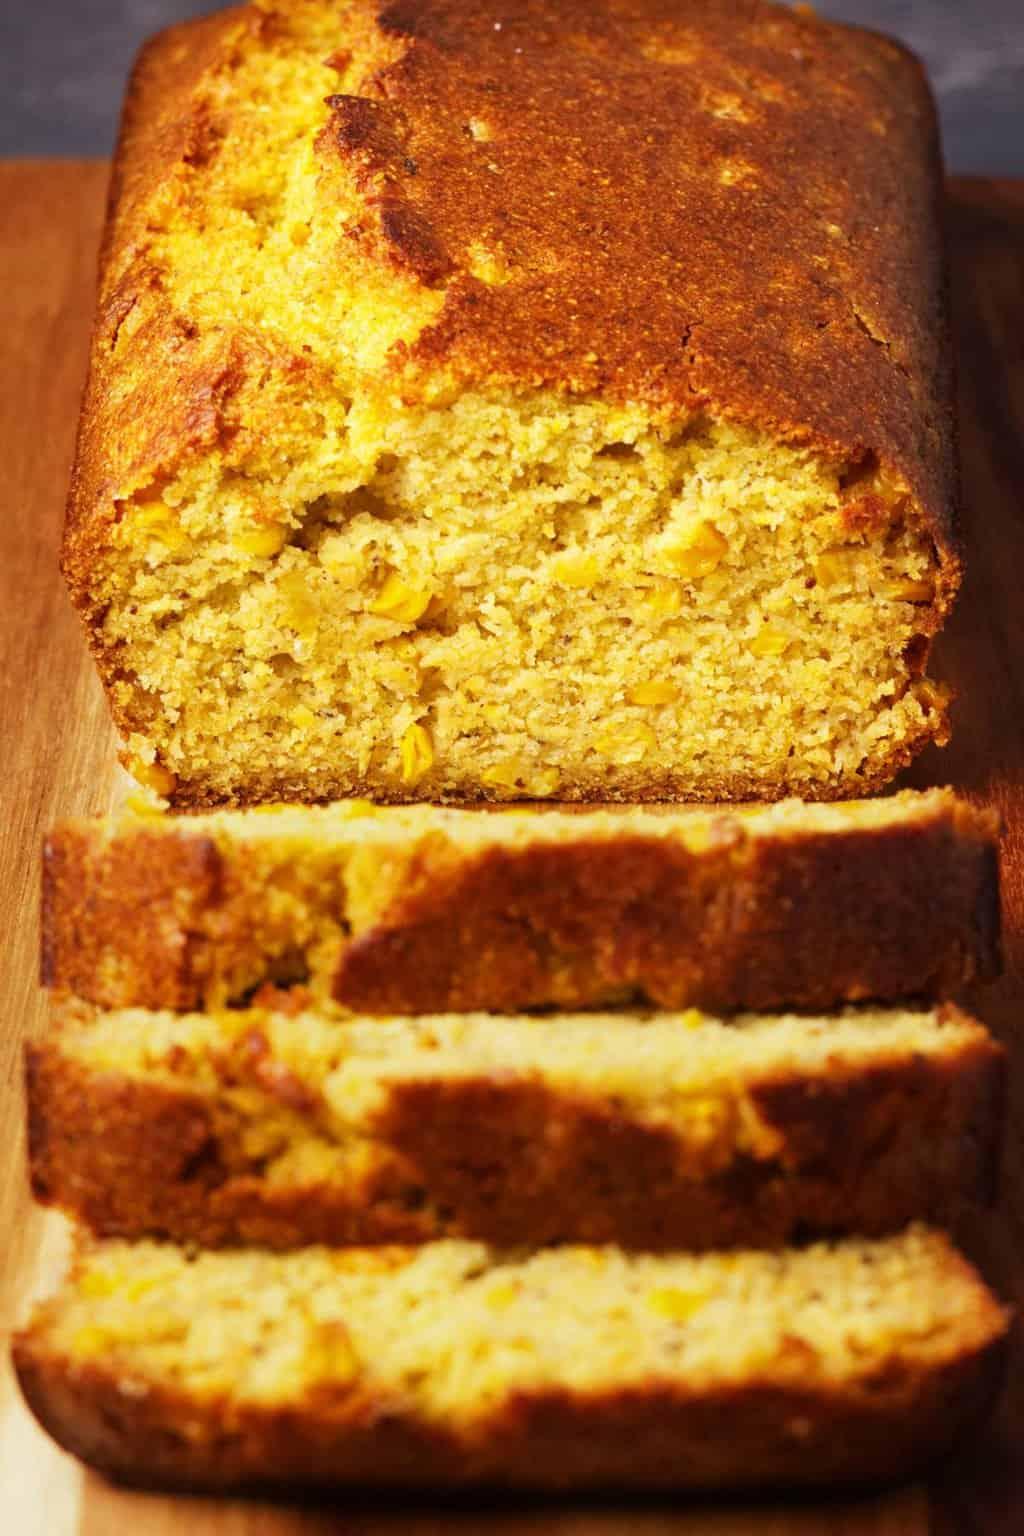 A loaf of vegan cornbread on a wooden board.